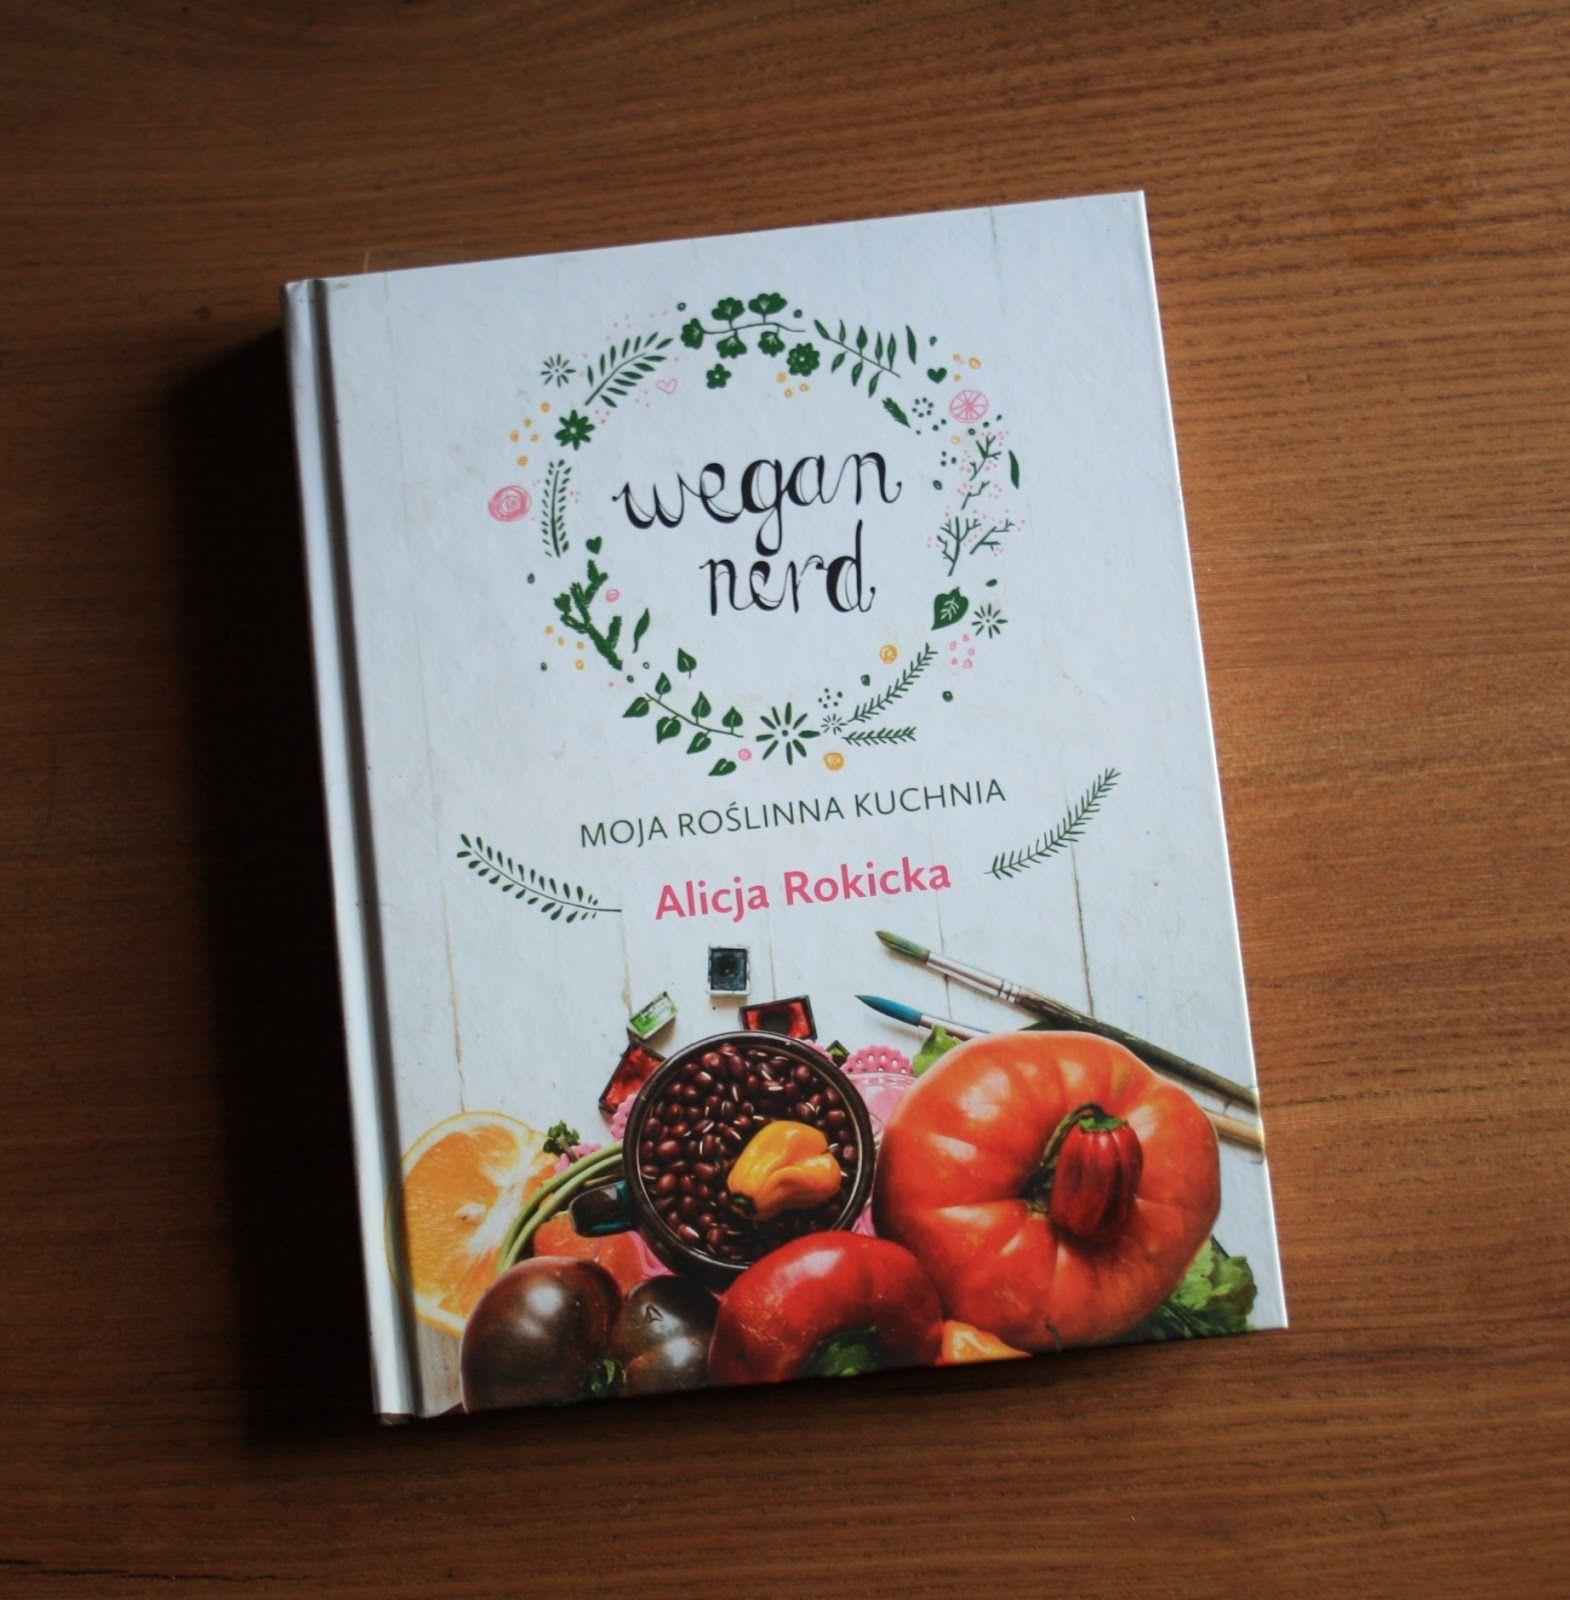 Ekoeksperymenty Recenzja Ksiazki Wegan Nerd Moja Kuchnia Roslinna Alicji Rokickiej Book Cover Art